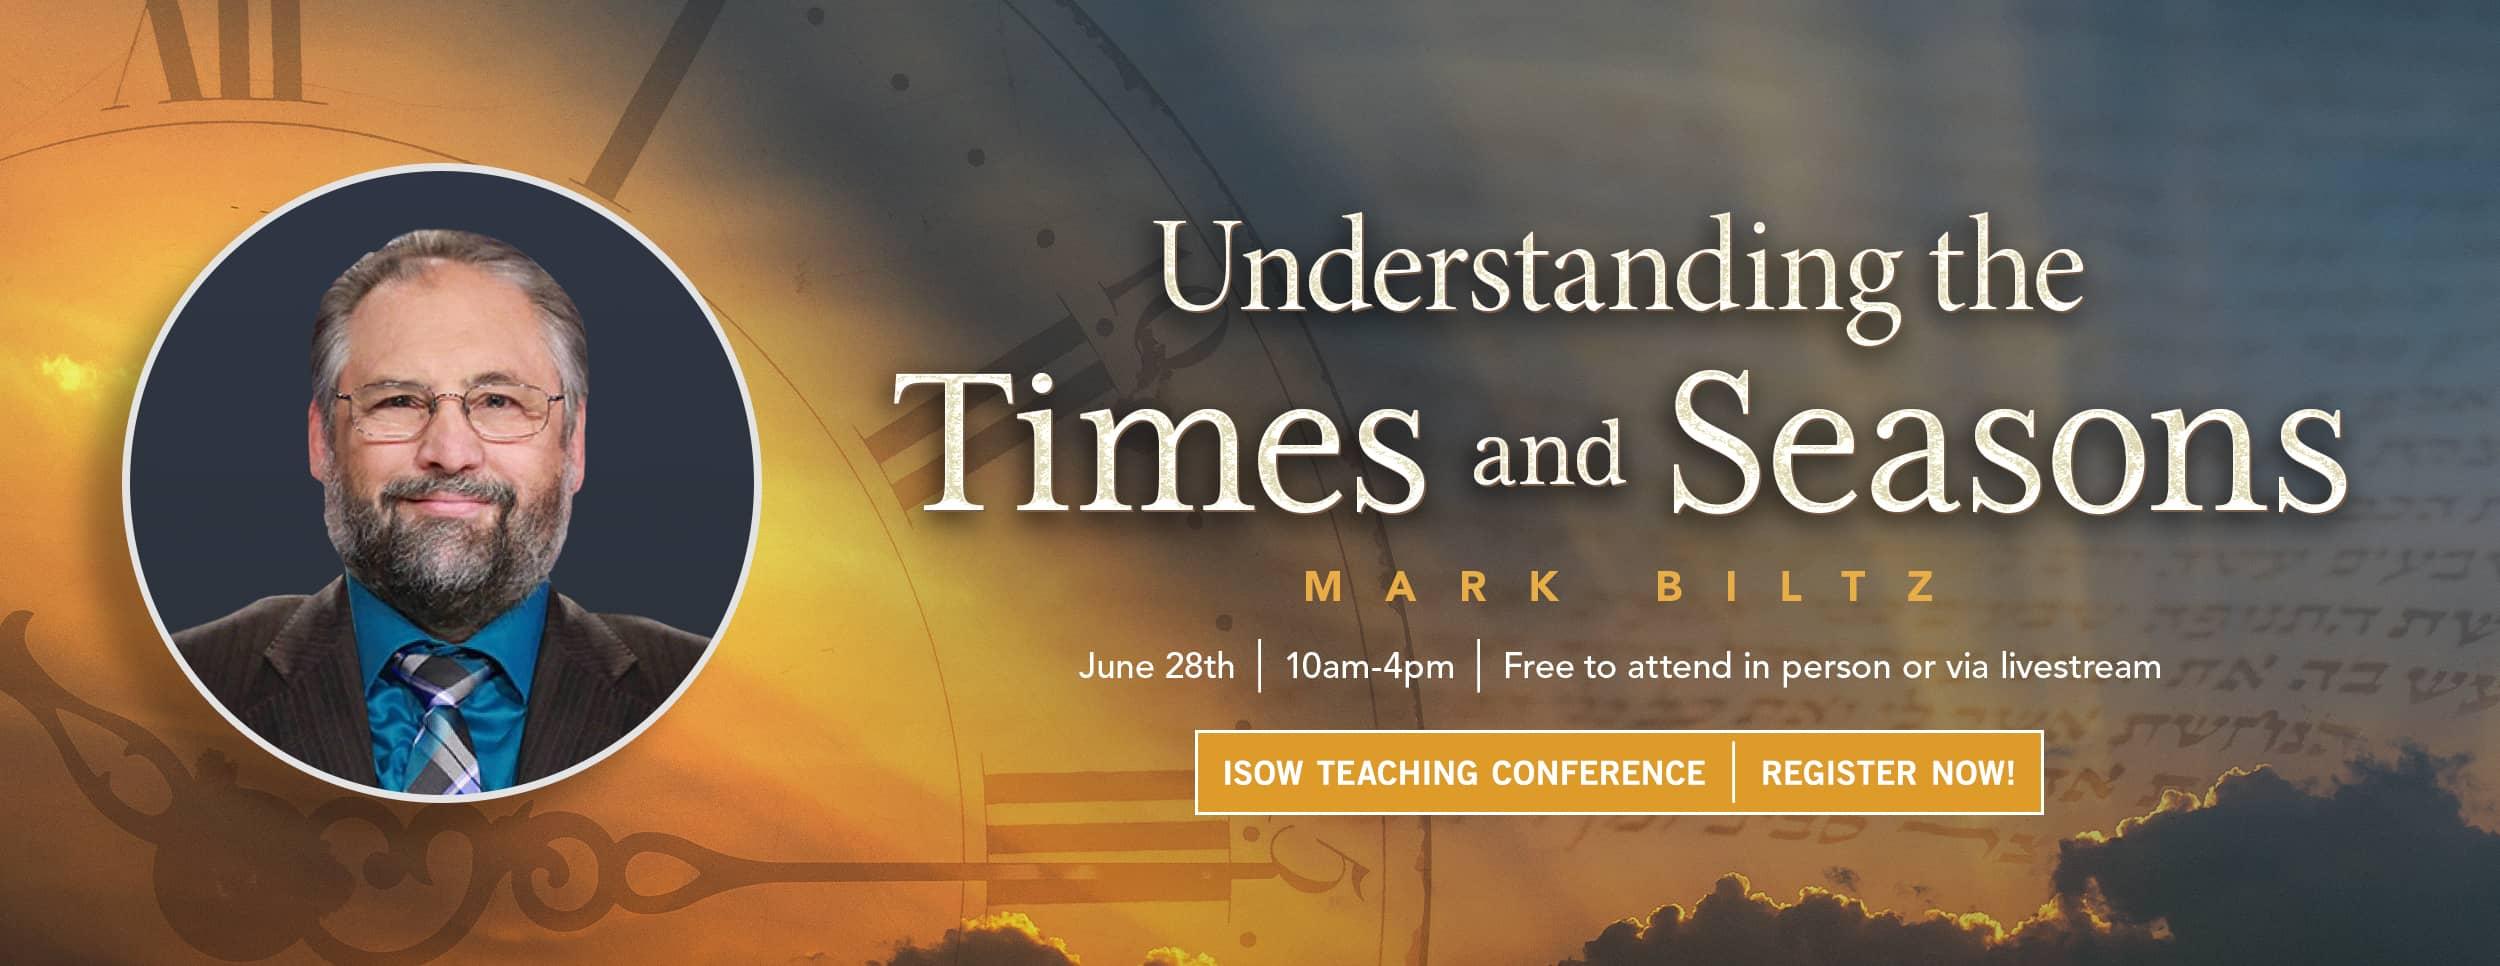 Mark Biltz – Understanding the Times and Seasons – Website Banner (1)